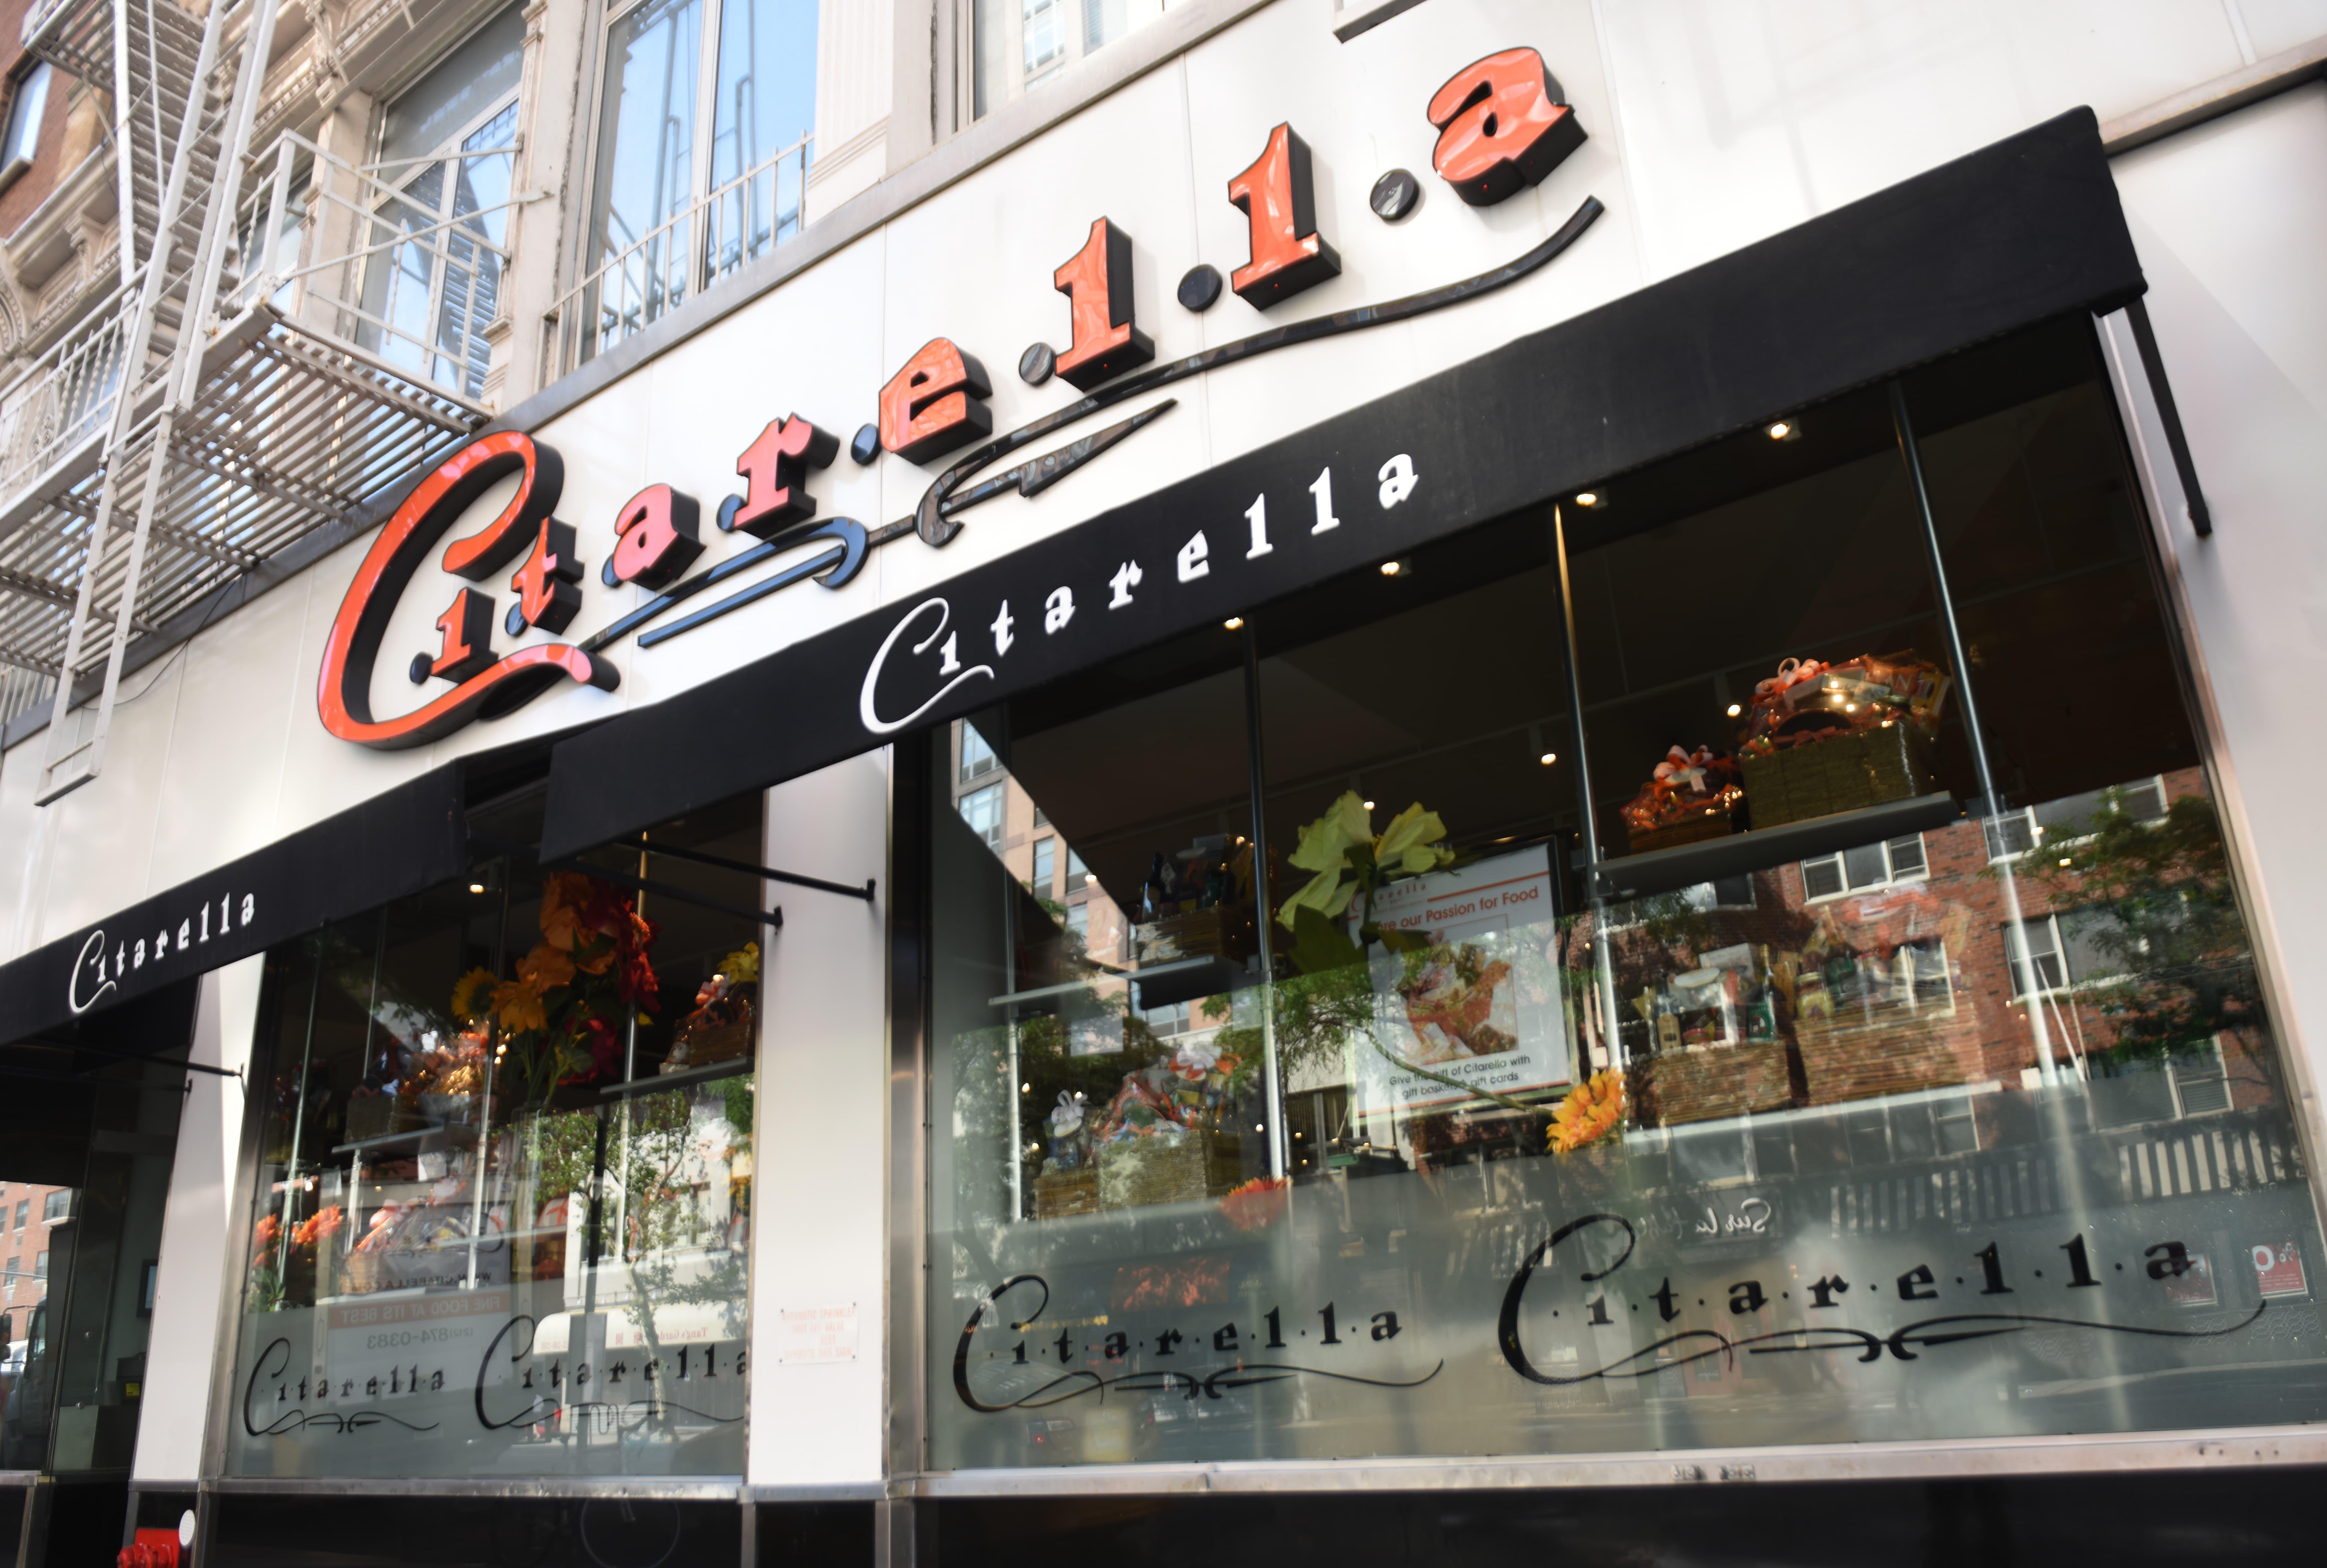 Citarella Gourmet Market - Upper East Side image 15